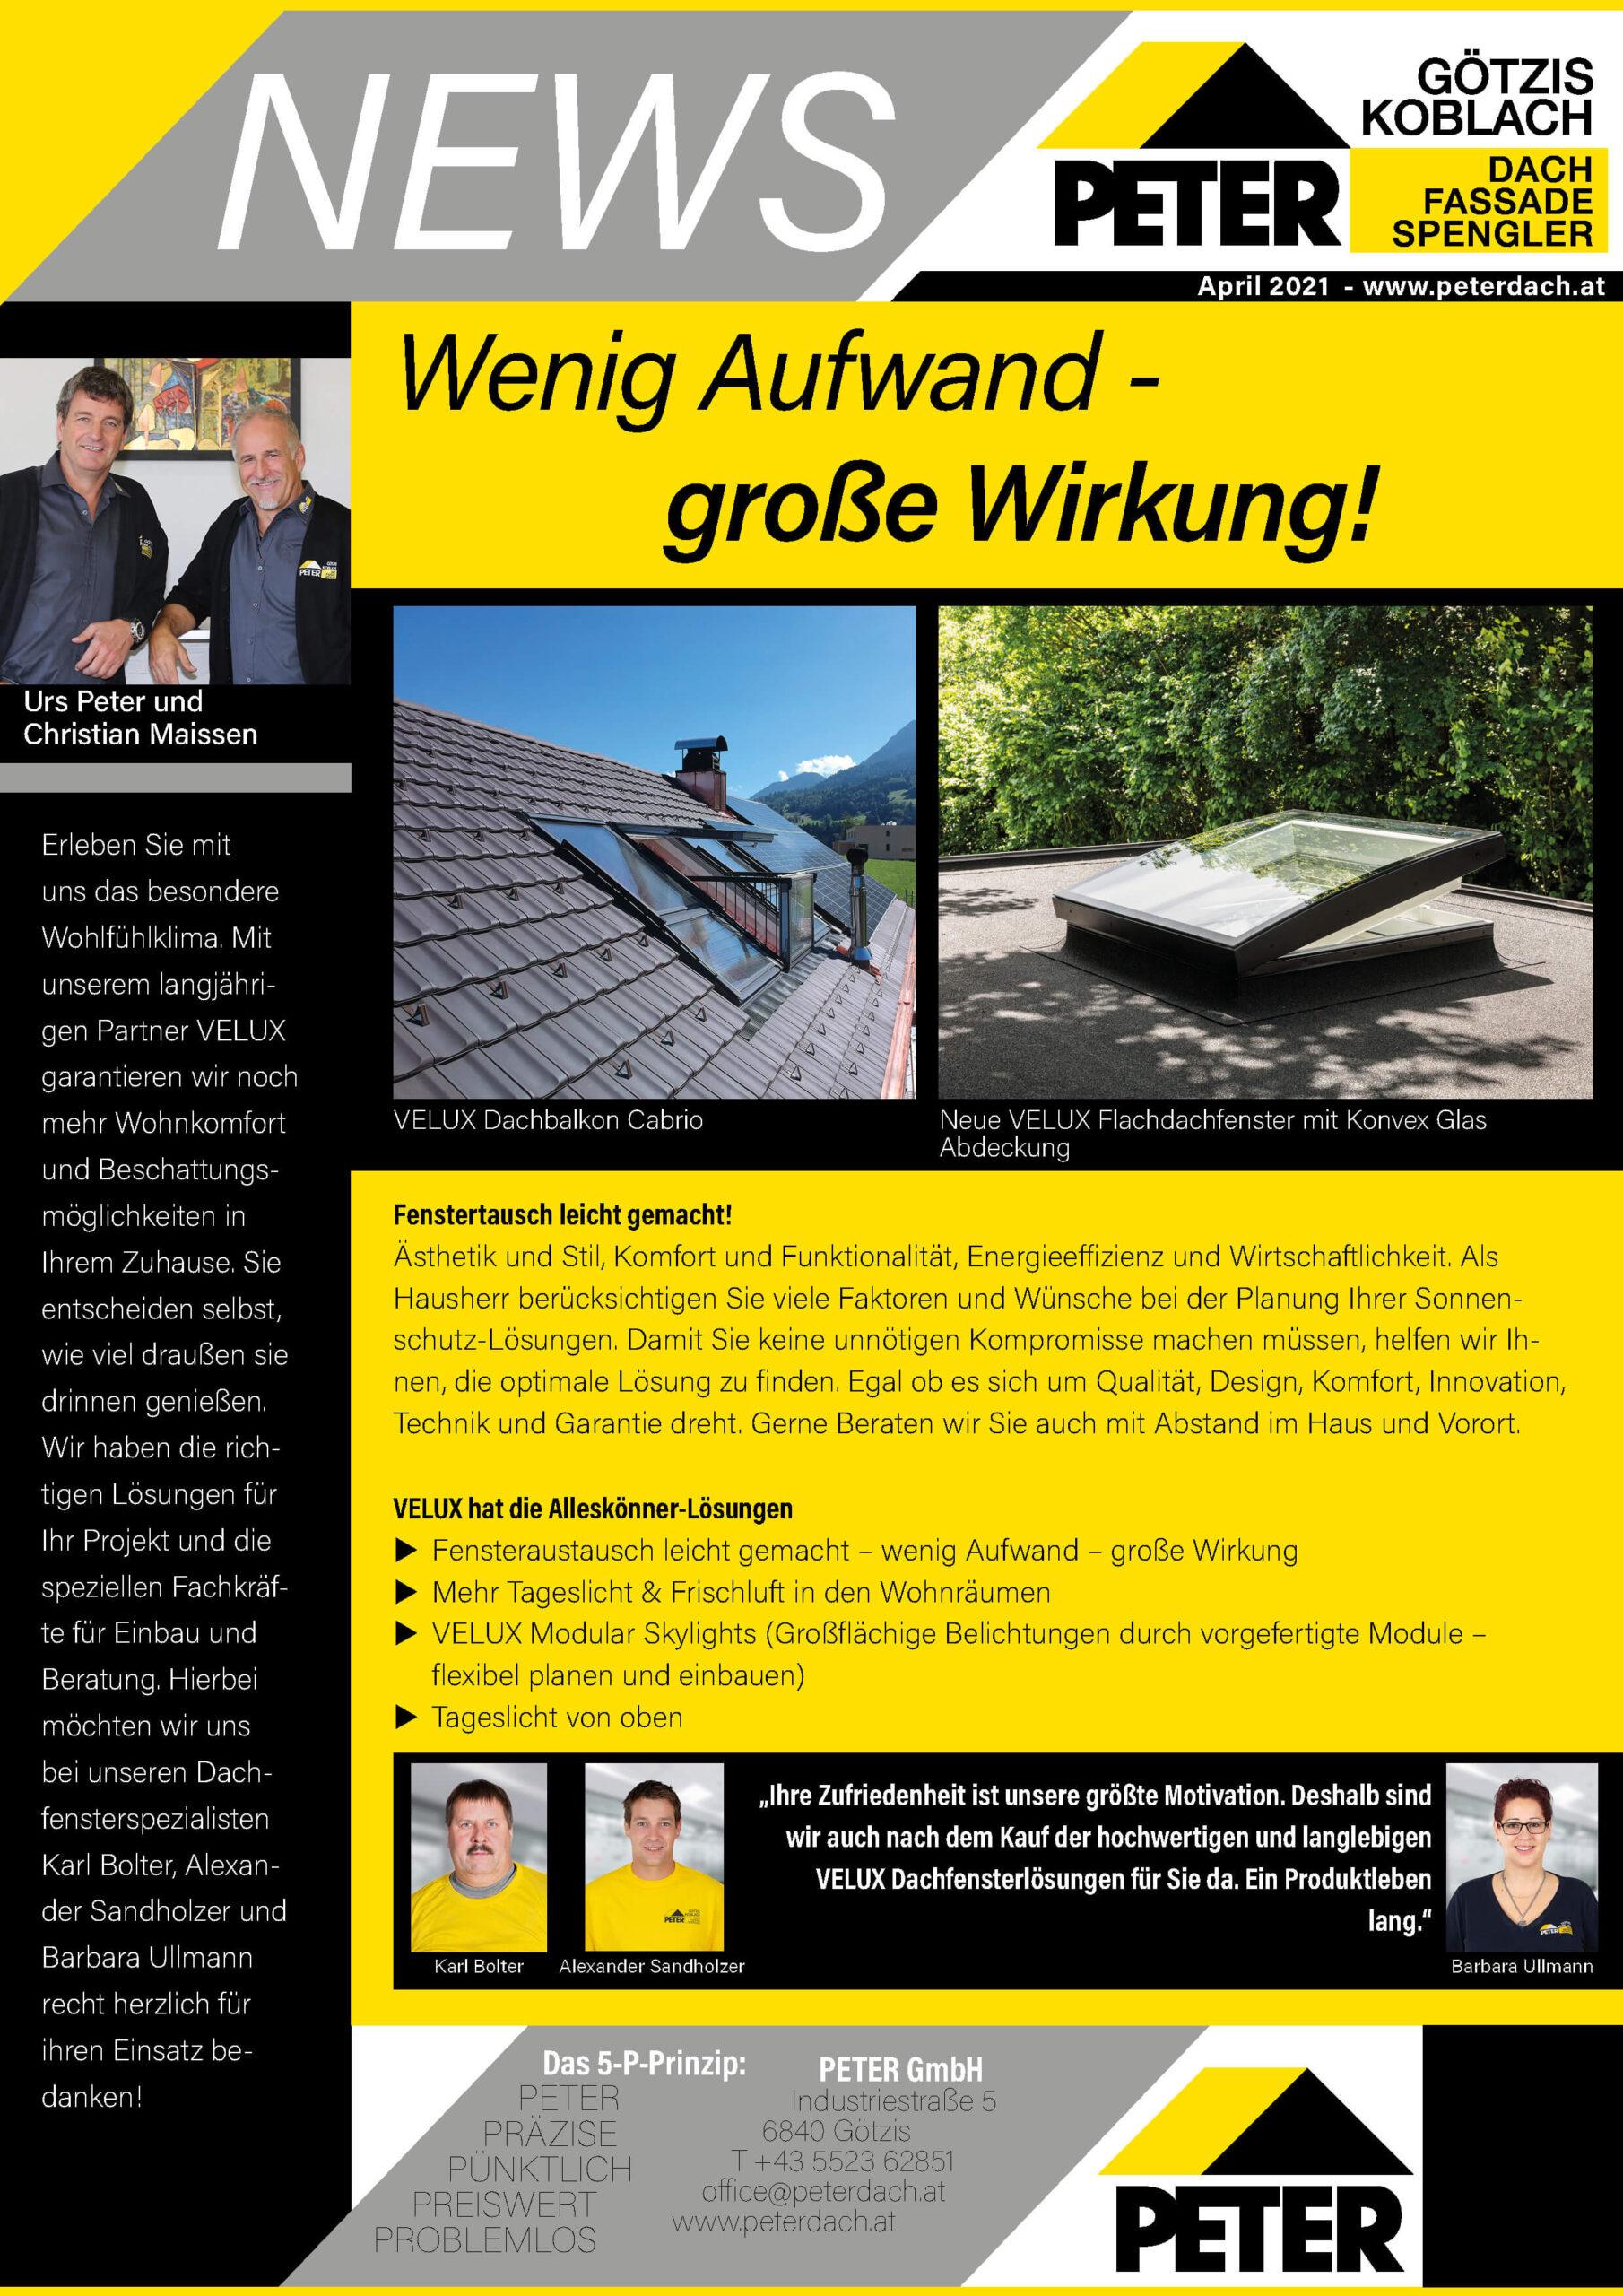 Peter-Dach-Spenglerei-Vorarlberg-News_2104_KW 15